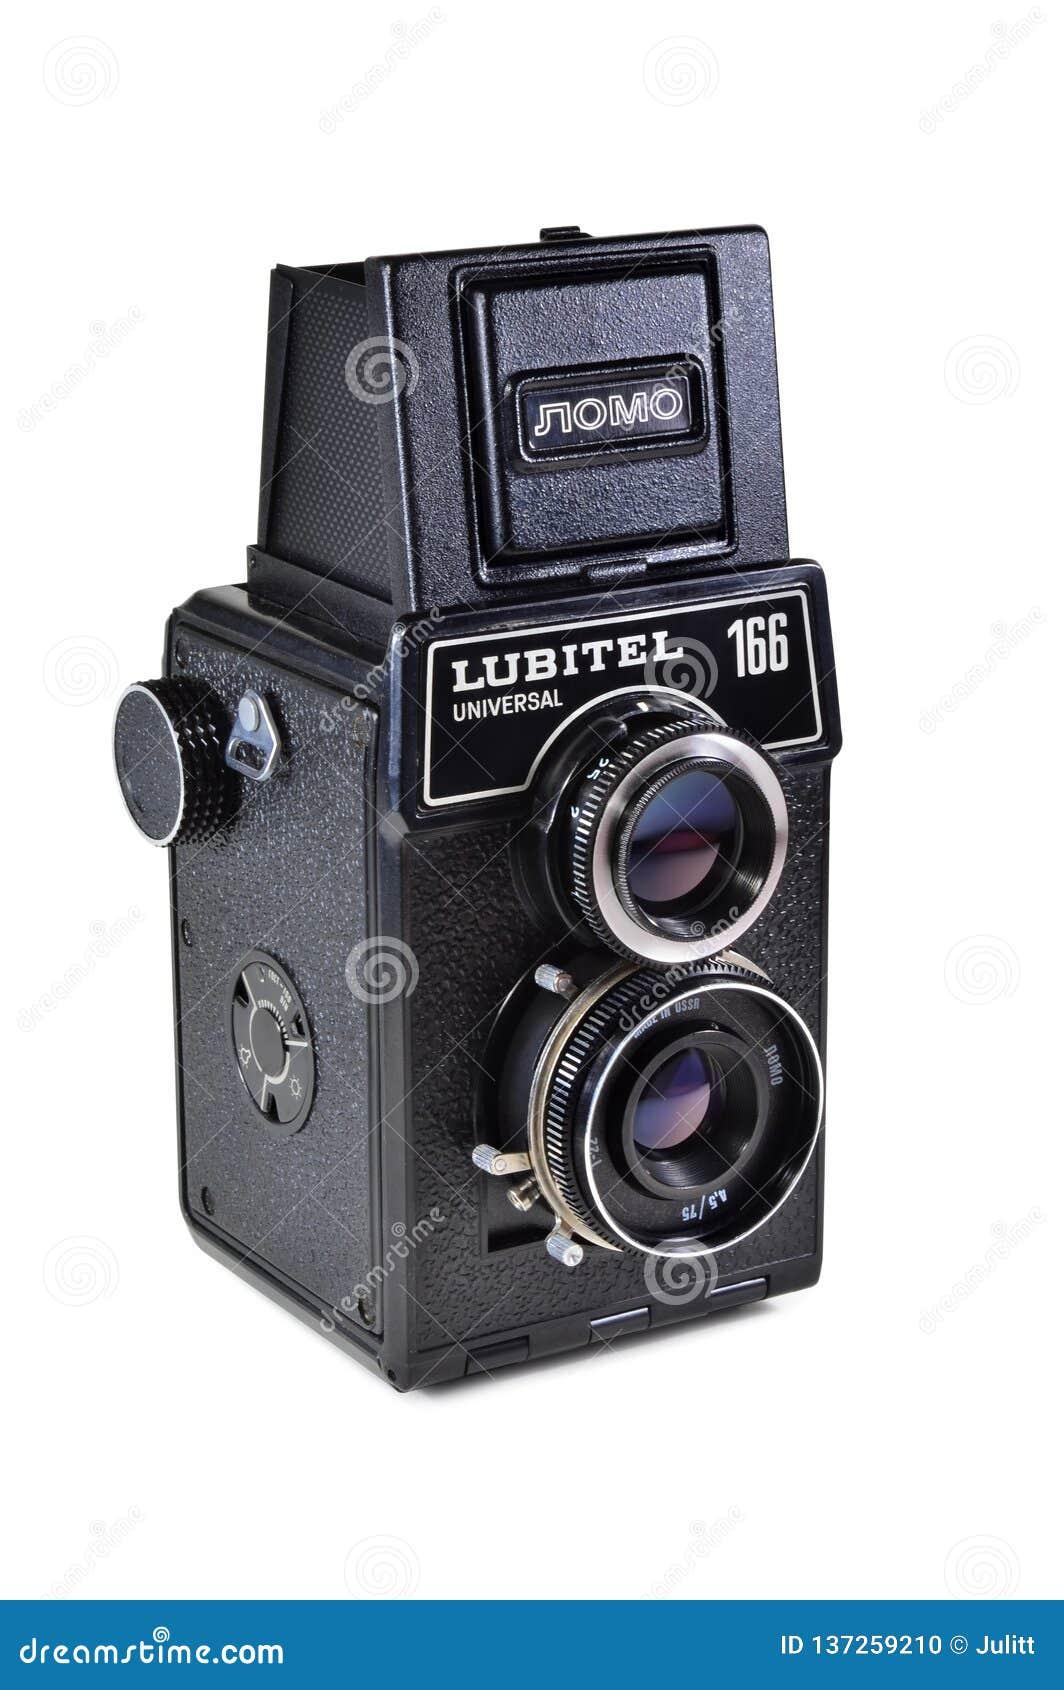 Vintage photo camera Lubitel-166 universal